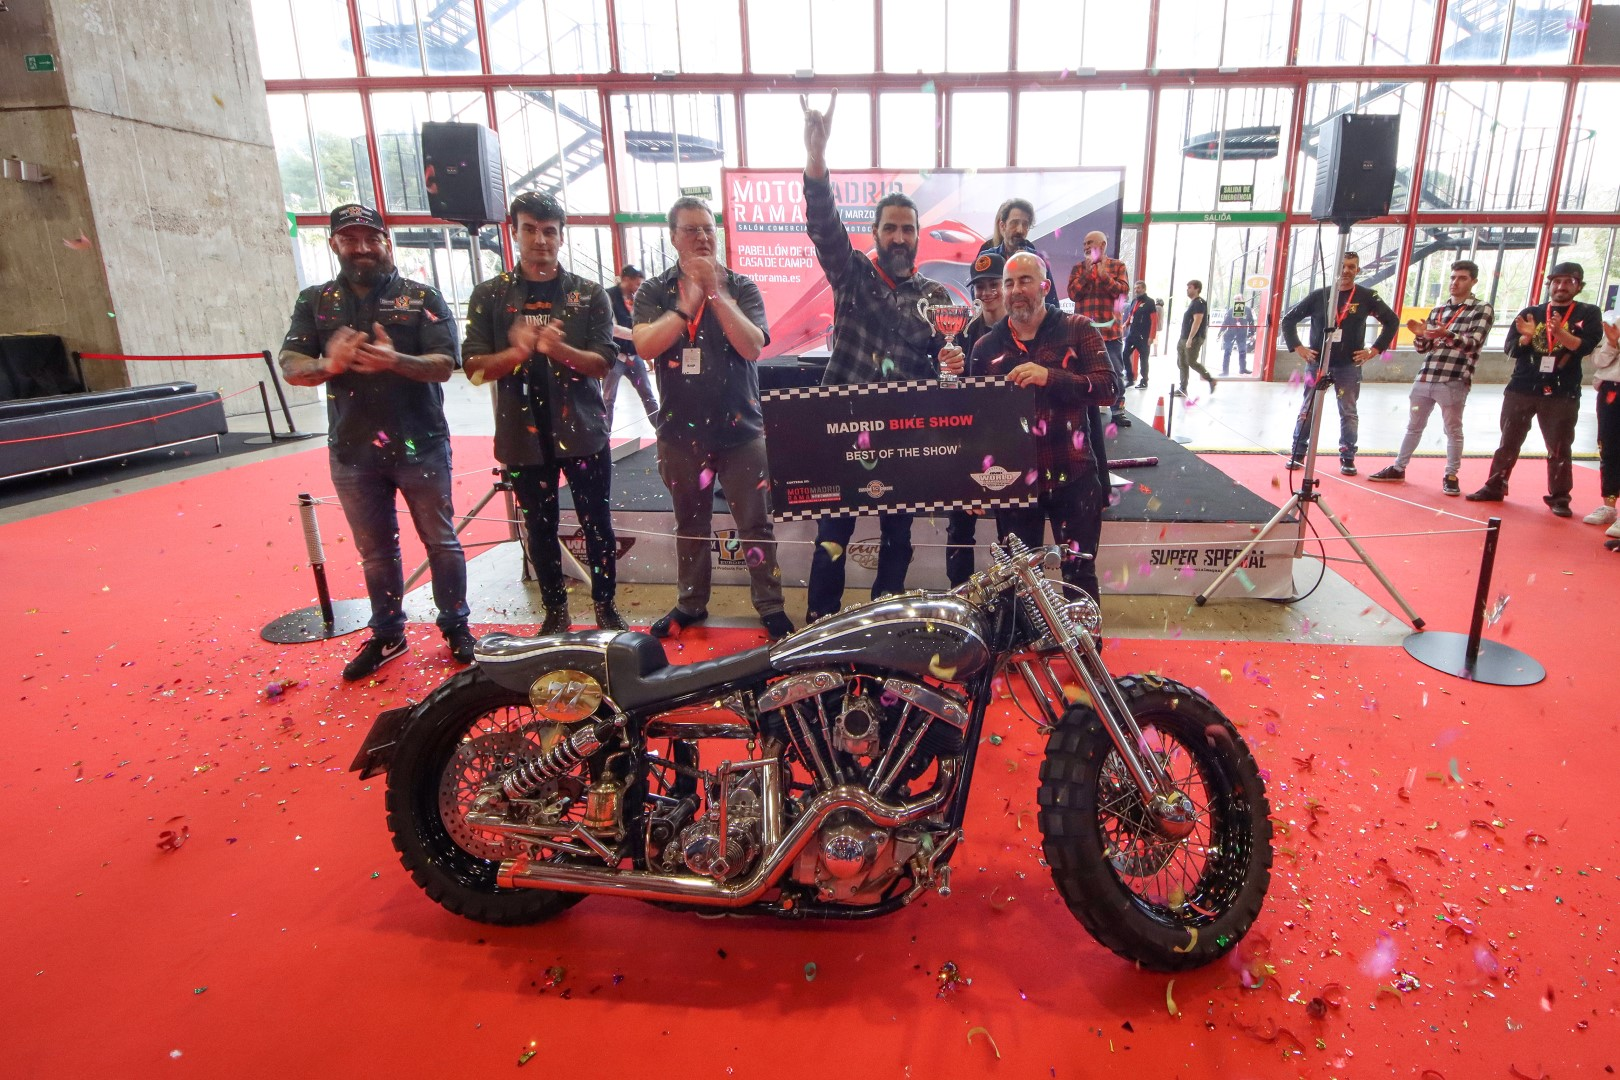 Old Custom Flames gana el Madrid Bike Show de Motorama 2020